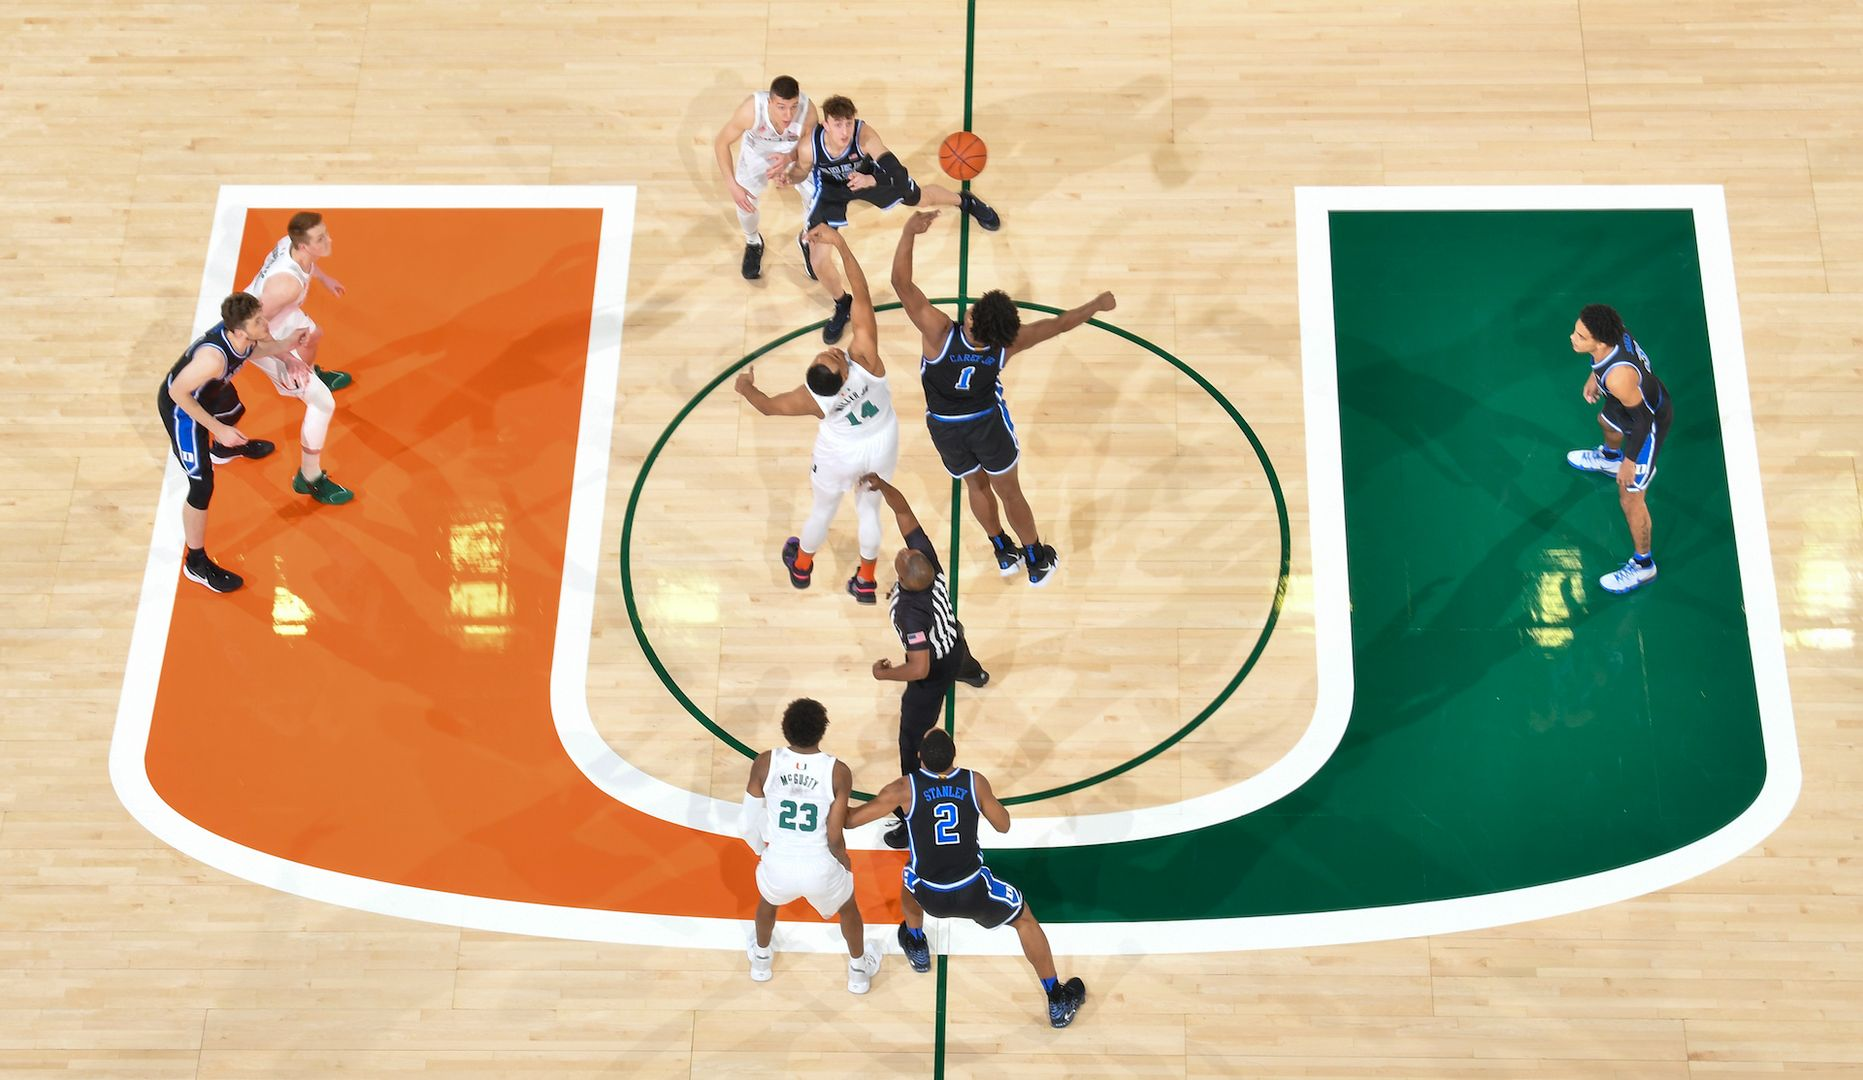 UM Athletics Selects Legends to Lead Marketing Partnerships